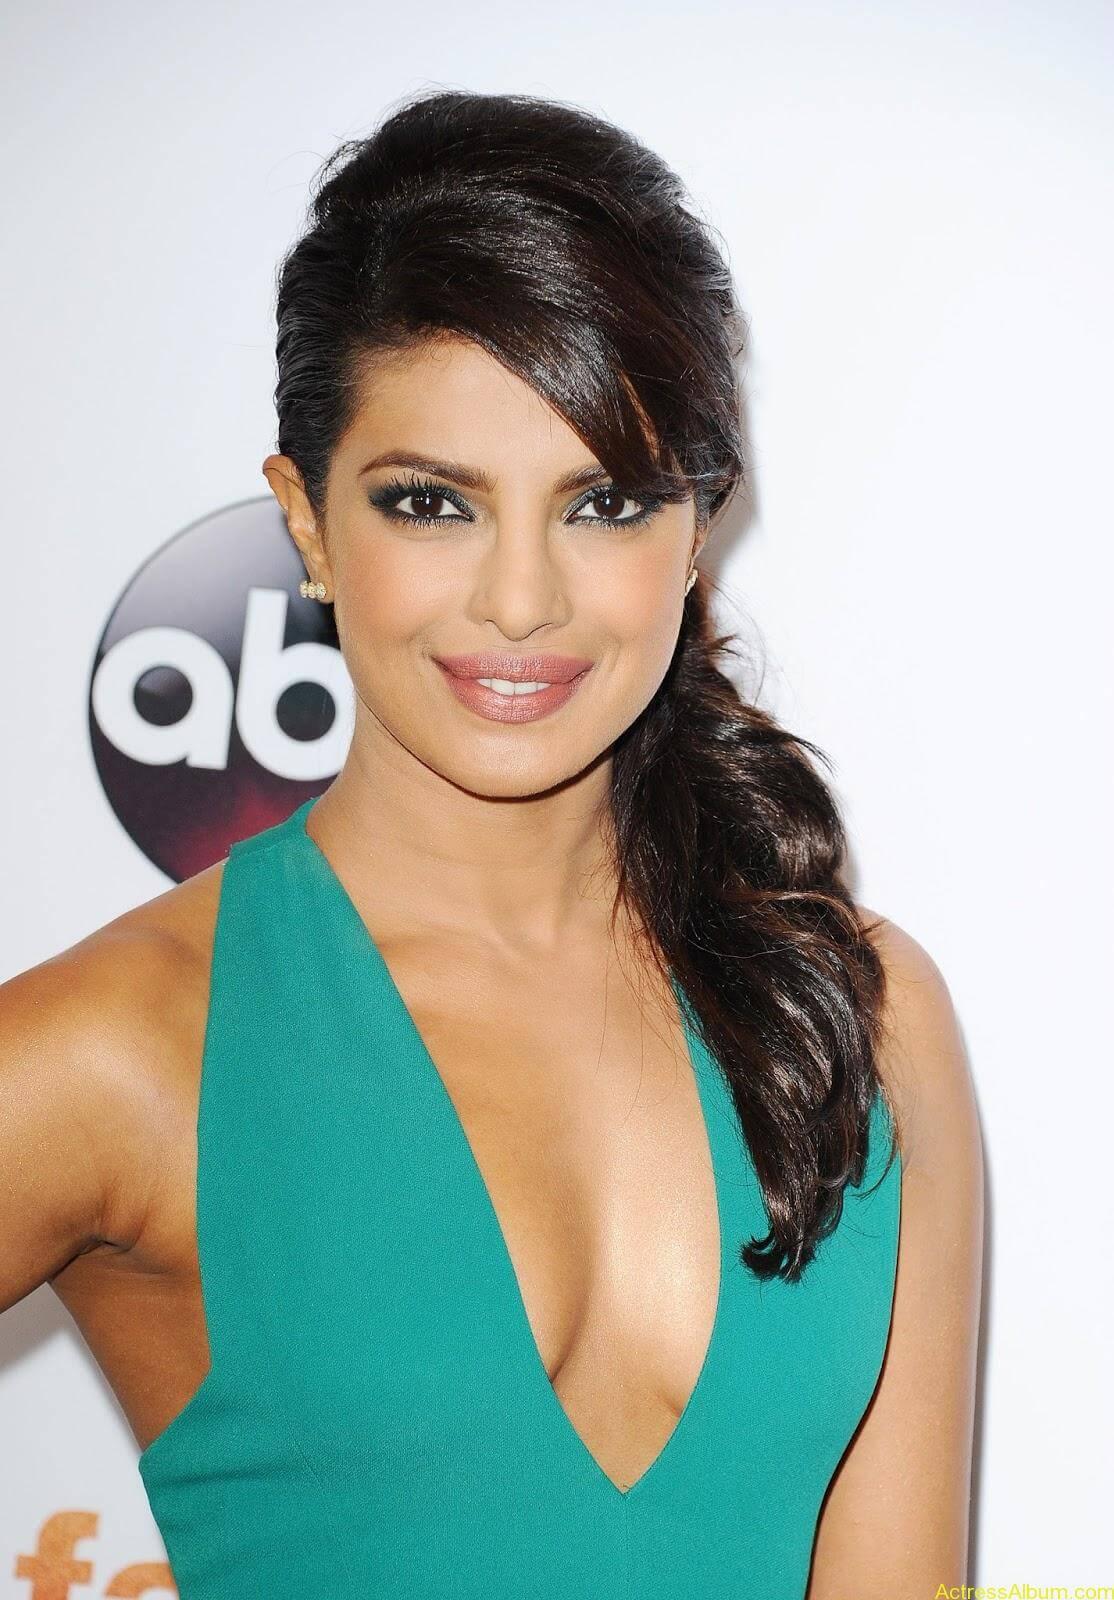 Priyanka-Chopra-Latest-Hot-Cleavage-Photos-Stills-3